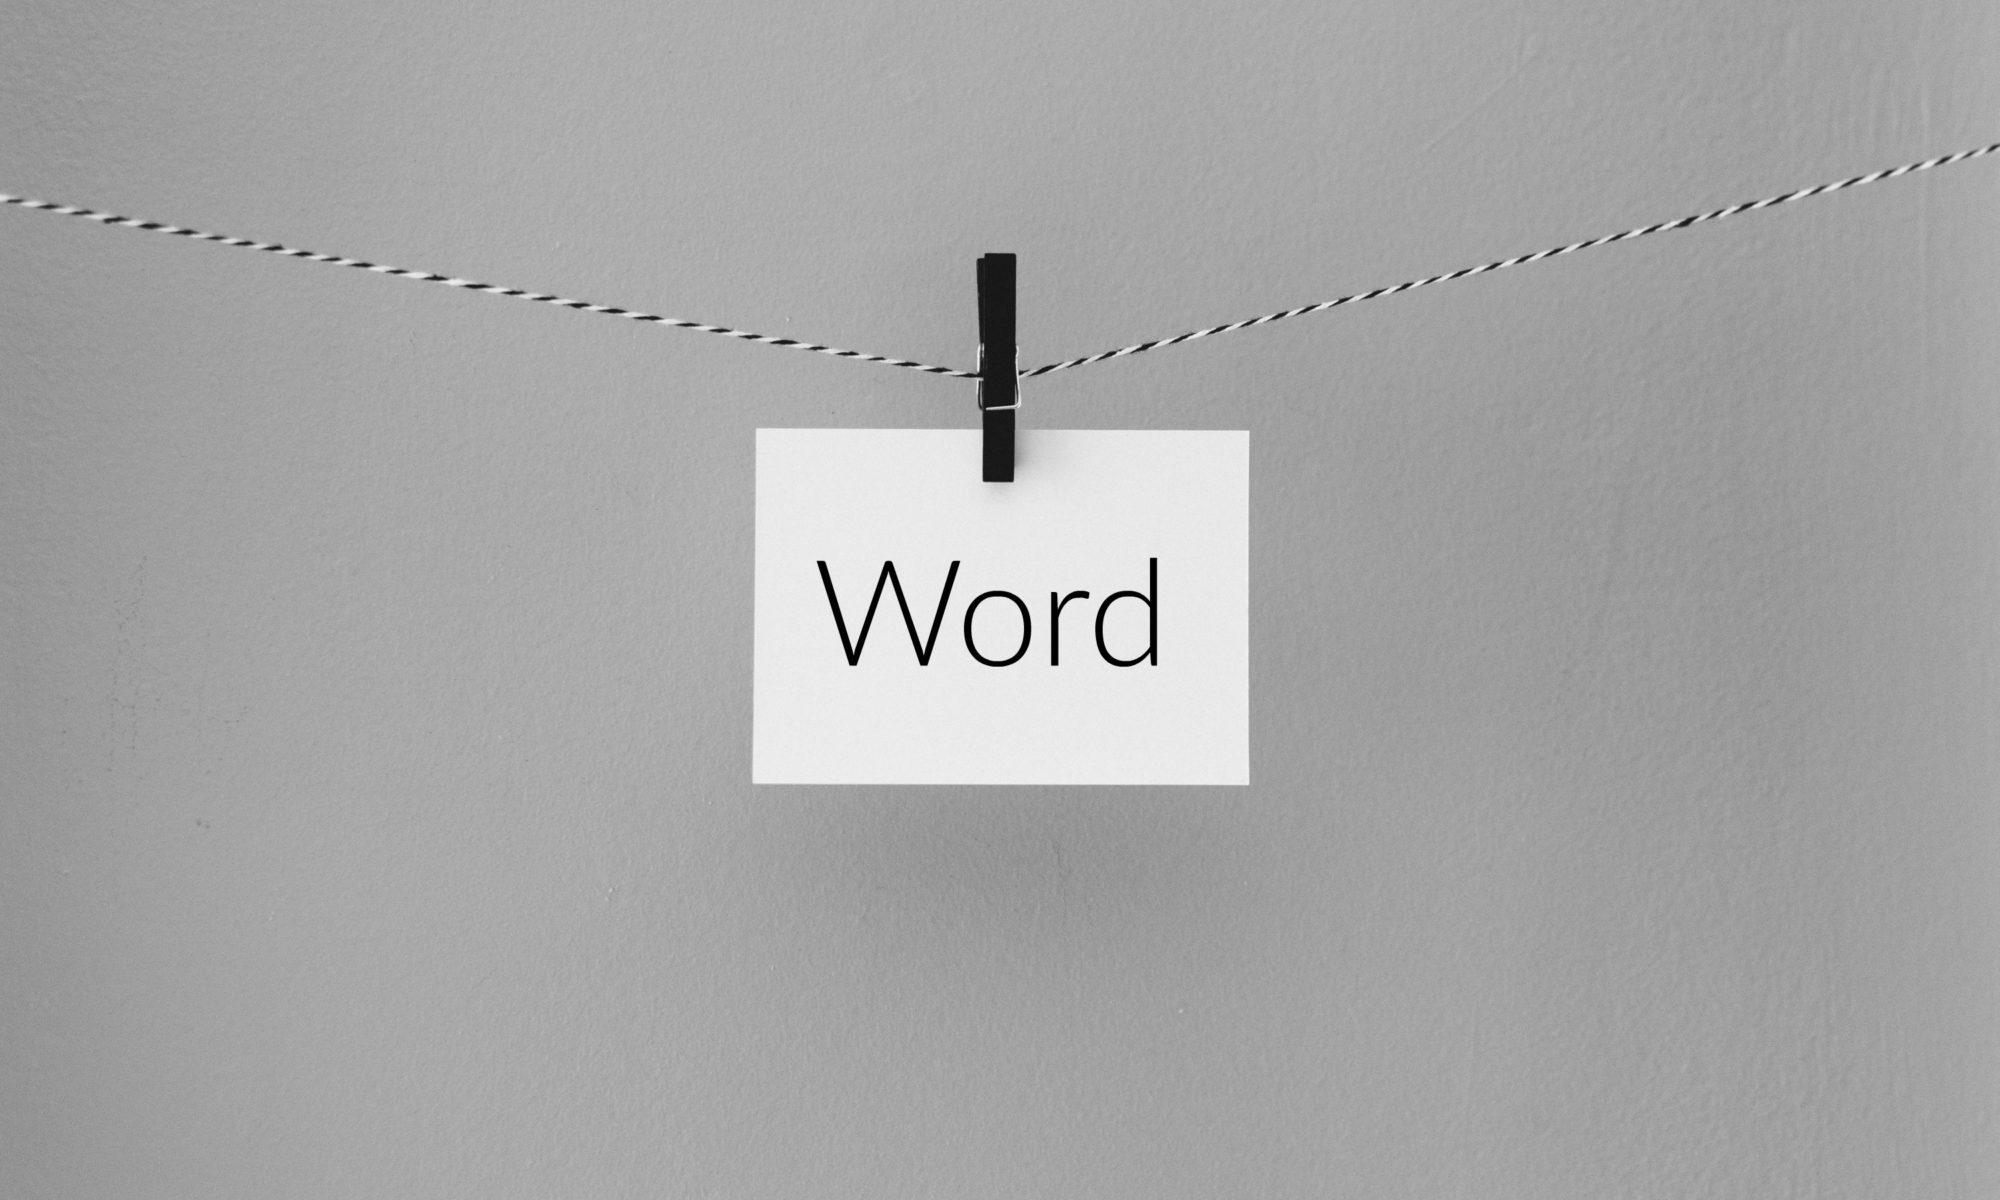 Word Revealed